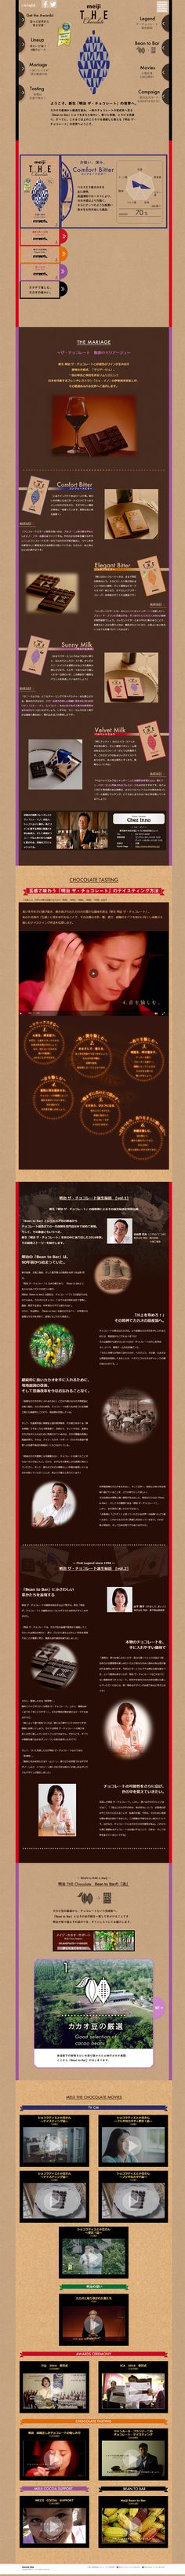 meiji THE Chocolate【食品関連】のLPデザイン。WEBデザイナーさん必見!ランディングページのデザイン参考に(シンプル系)